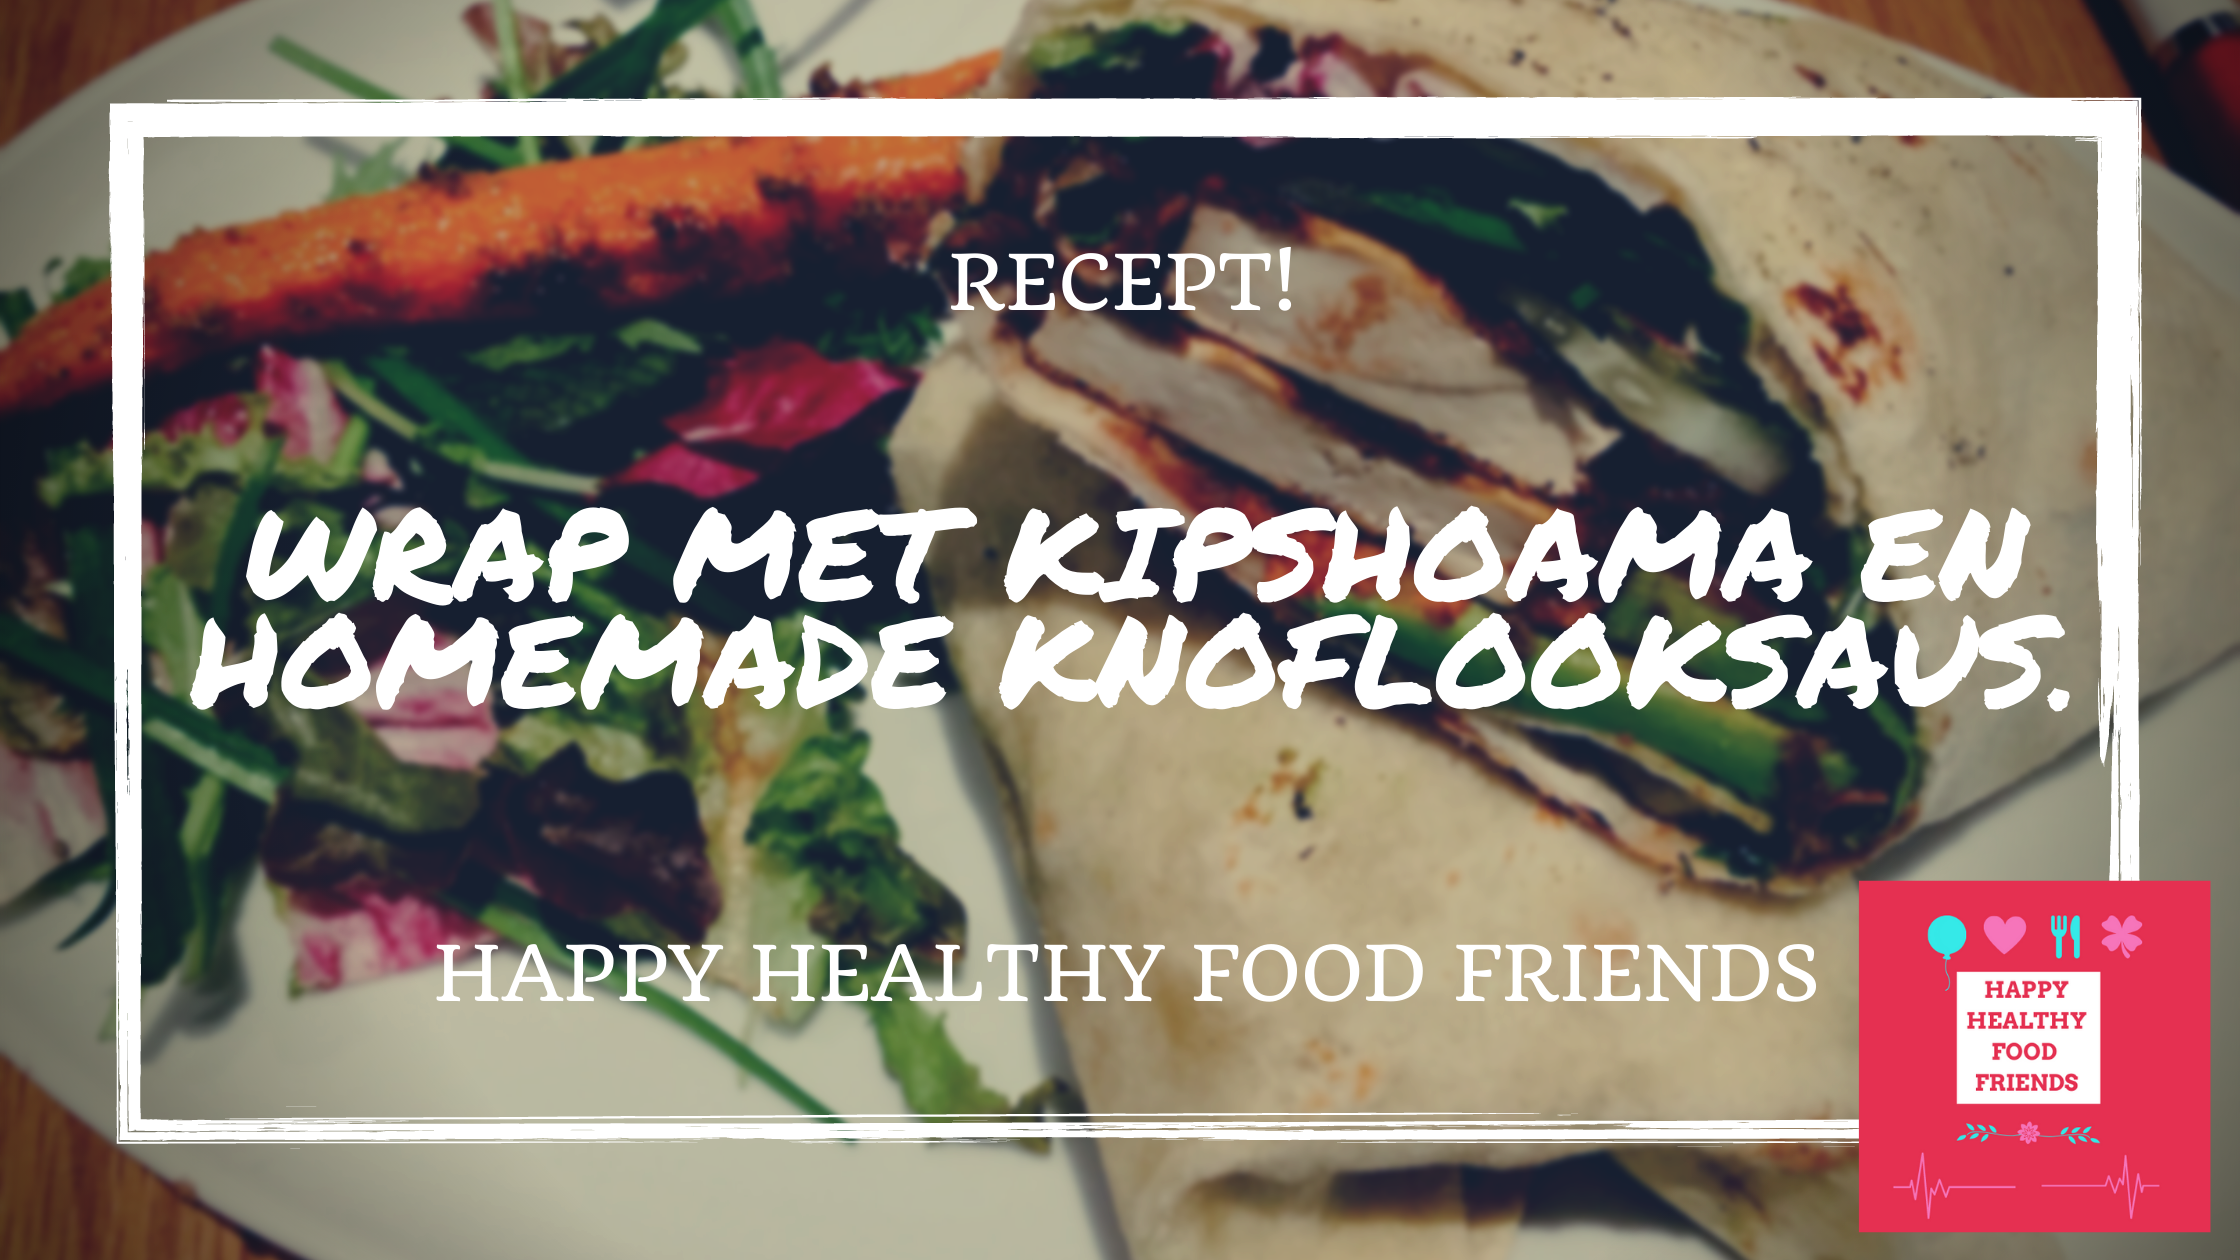 Wrap met kipshoarma en homemade knoflooksaus